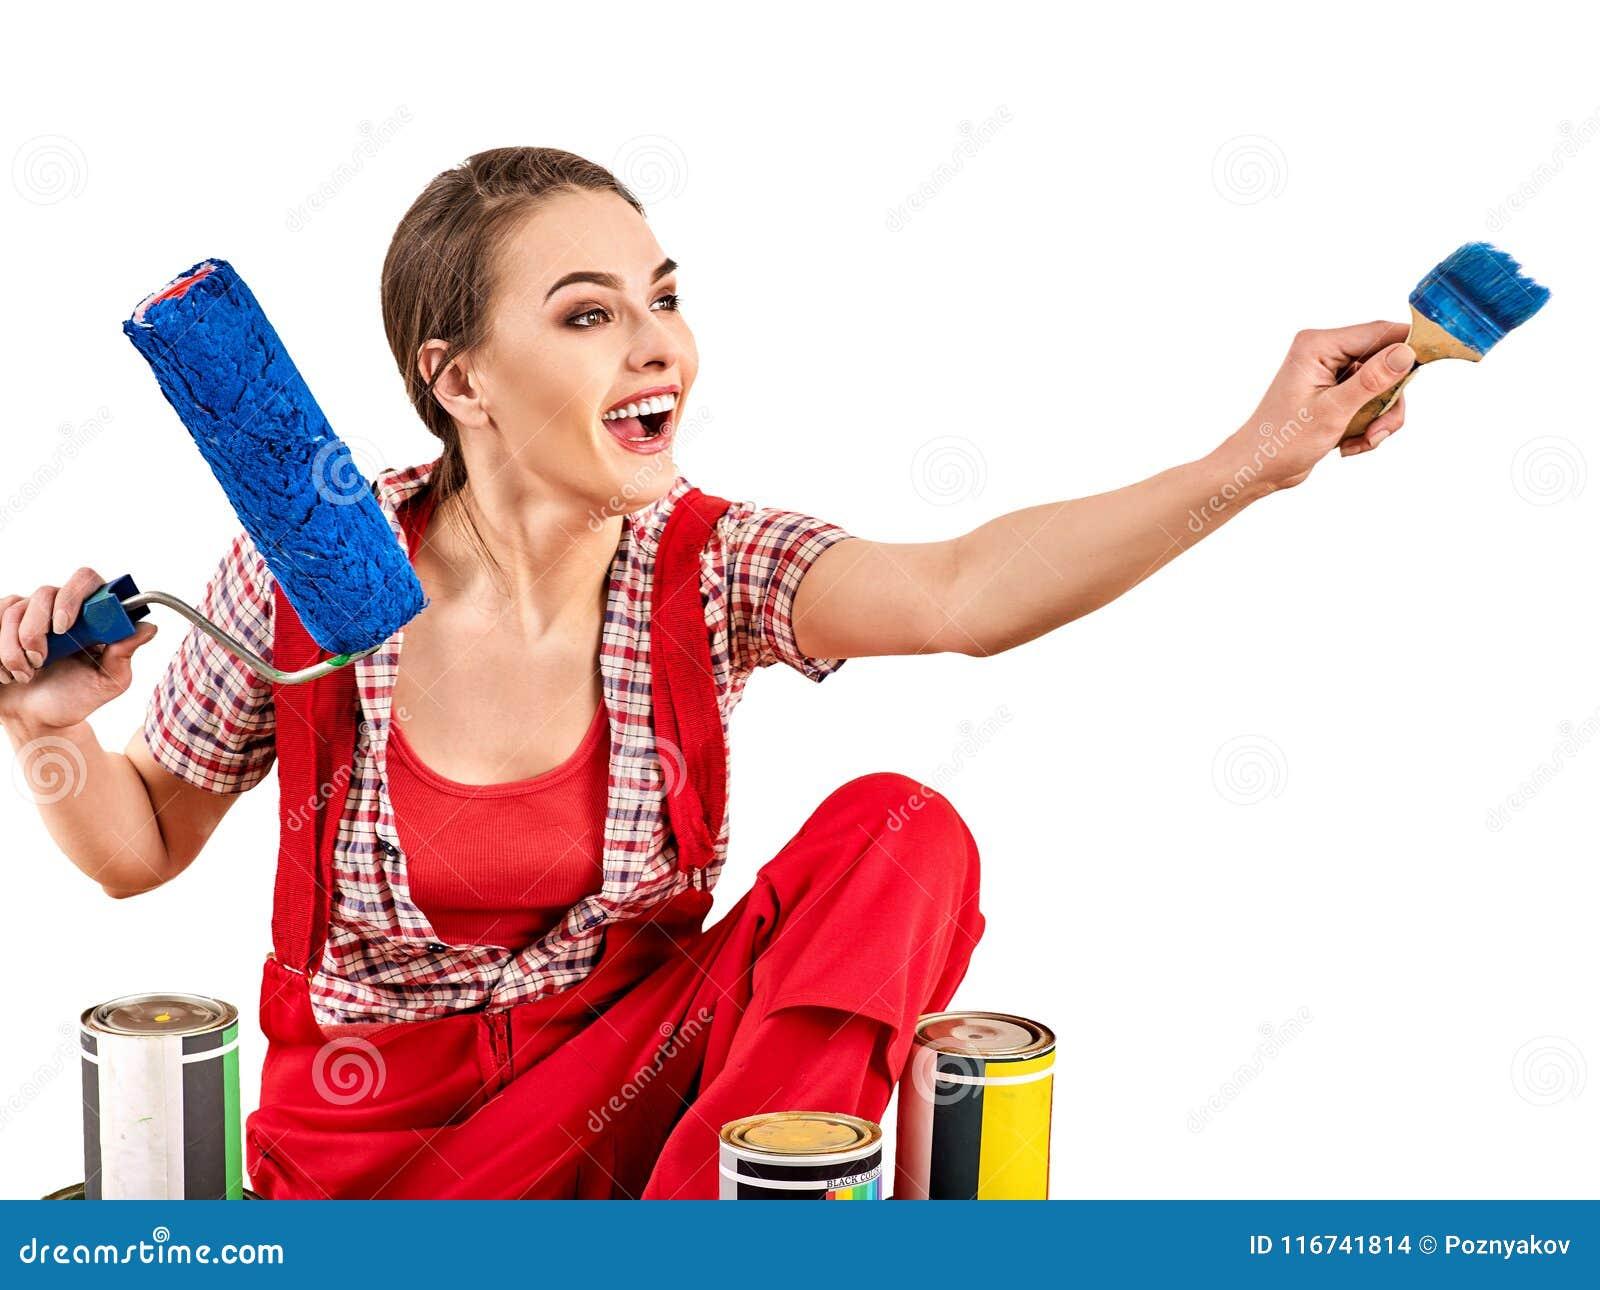 Tapete Reparieren reparieren sie die hauptfrau, die farbenrolle für tapete hält